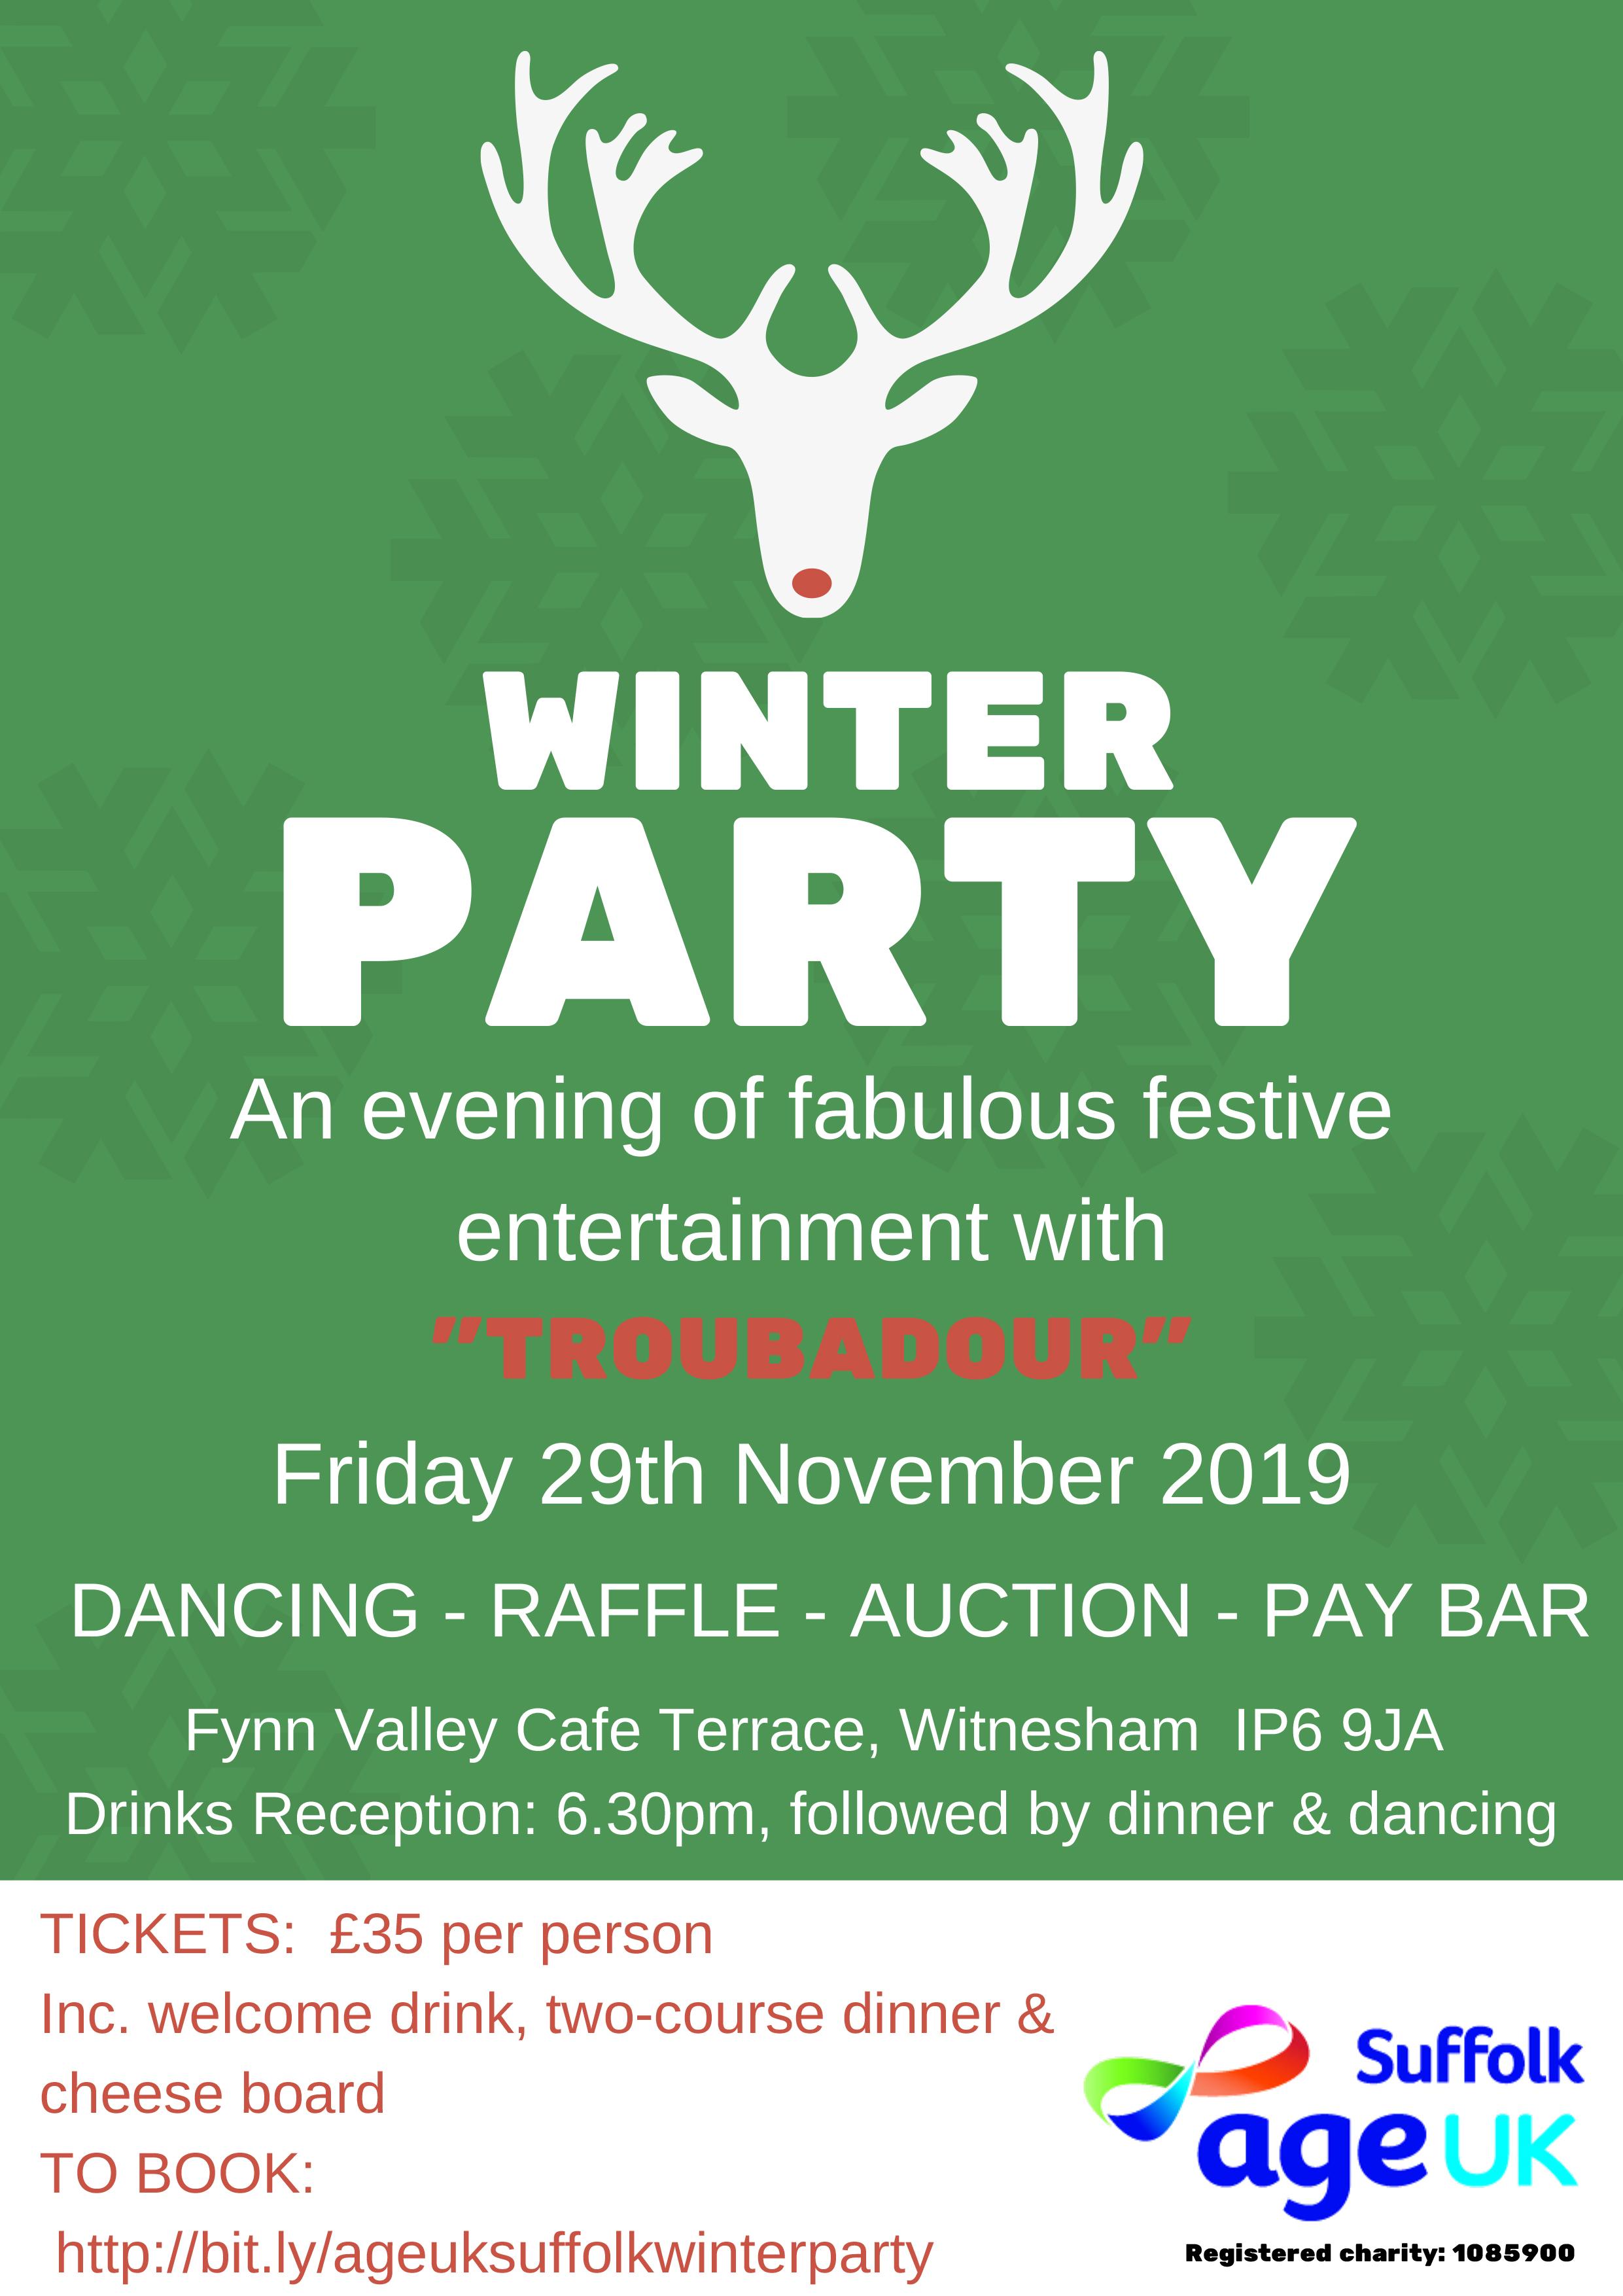 Winter Party Flyer.jpg